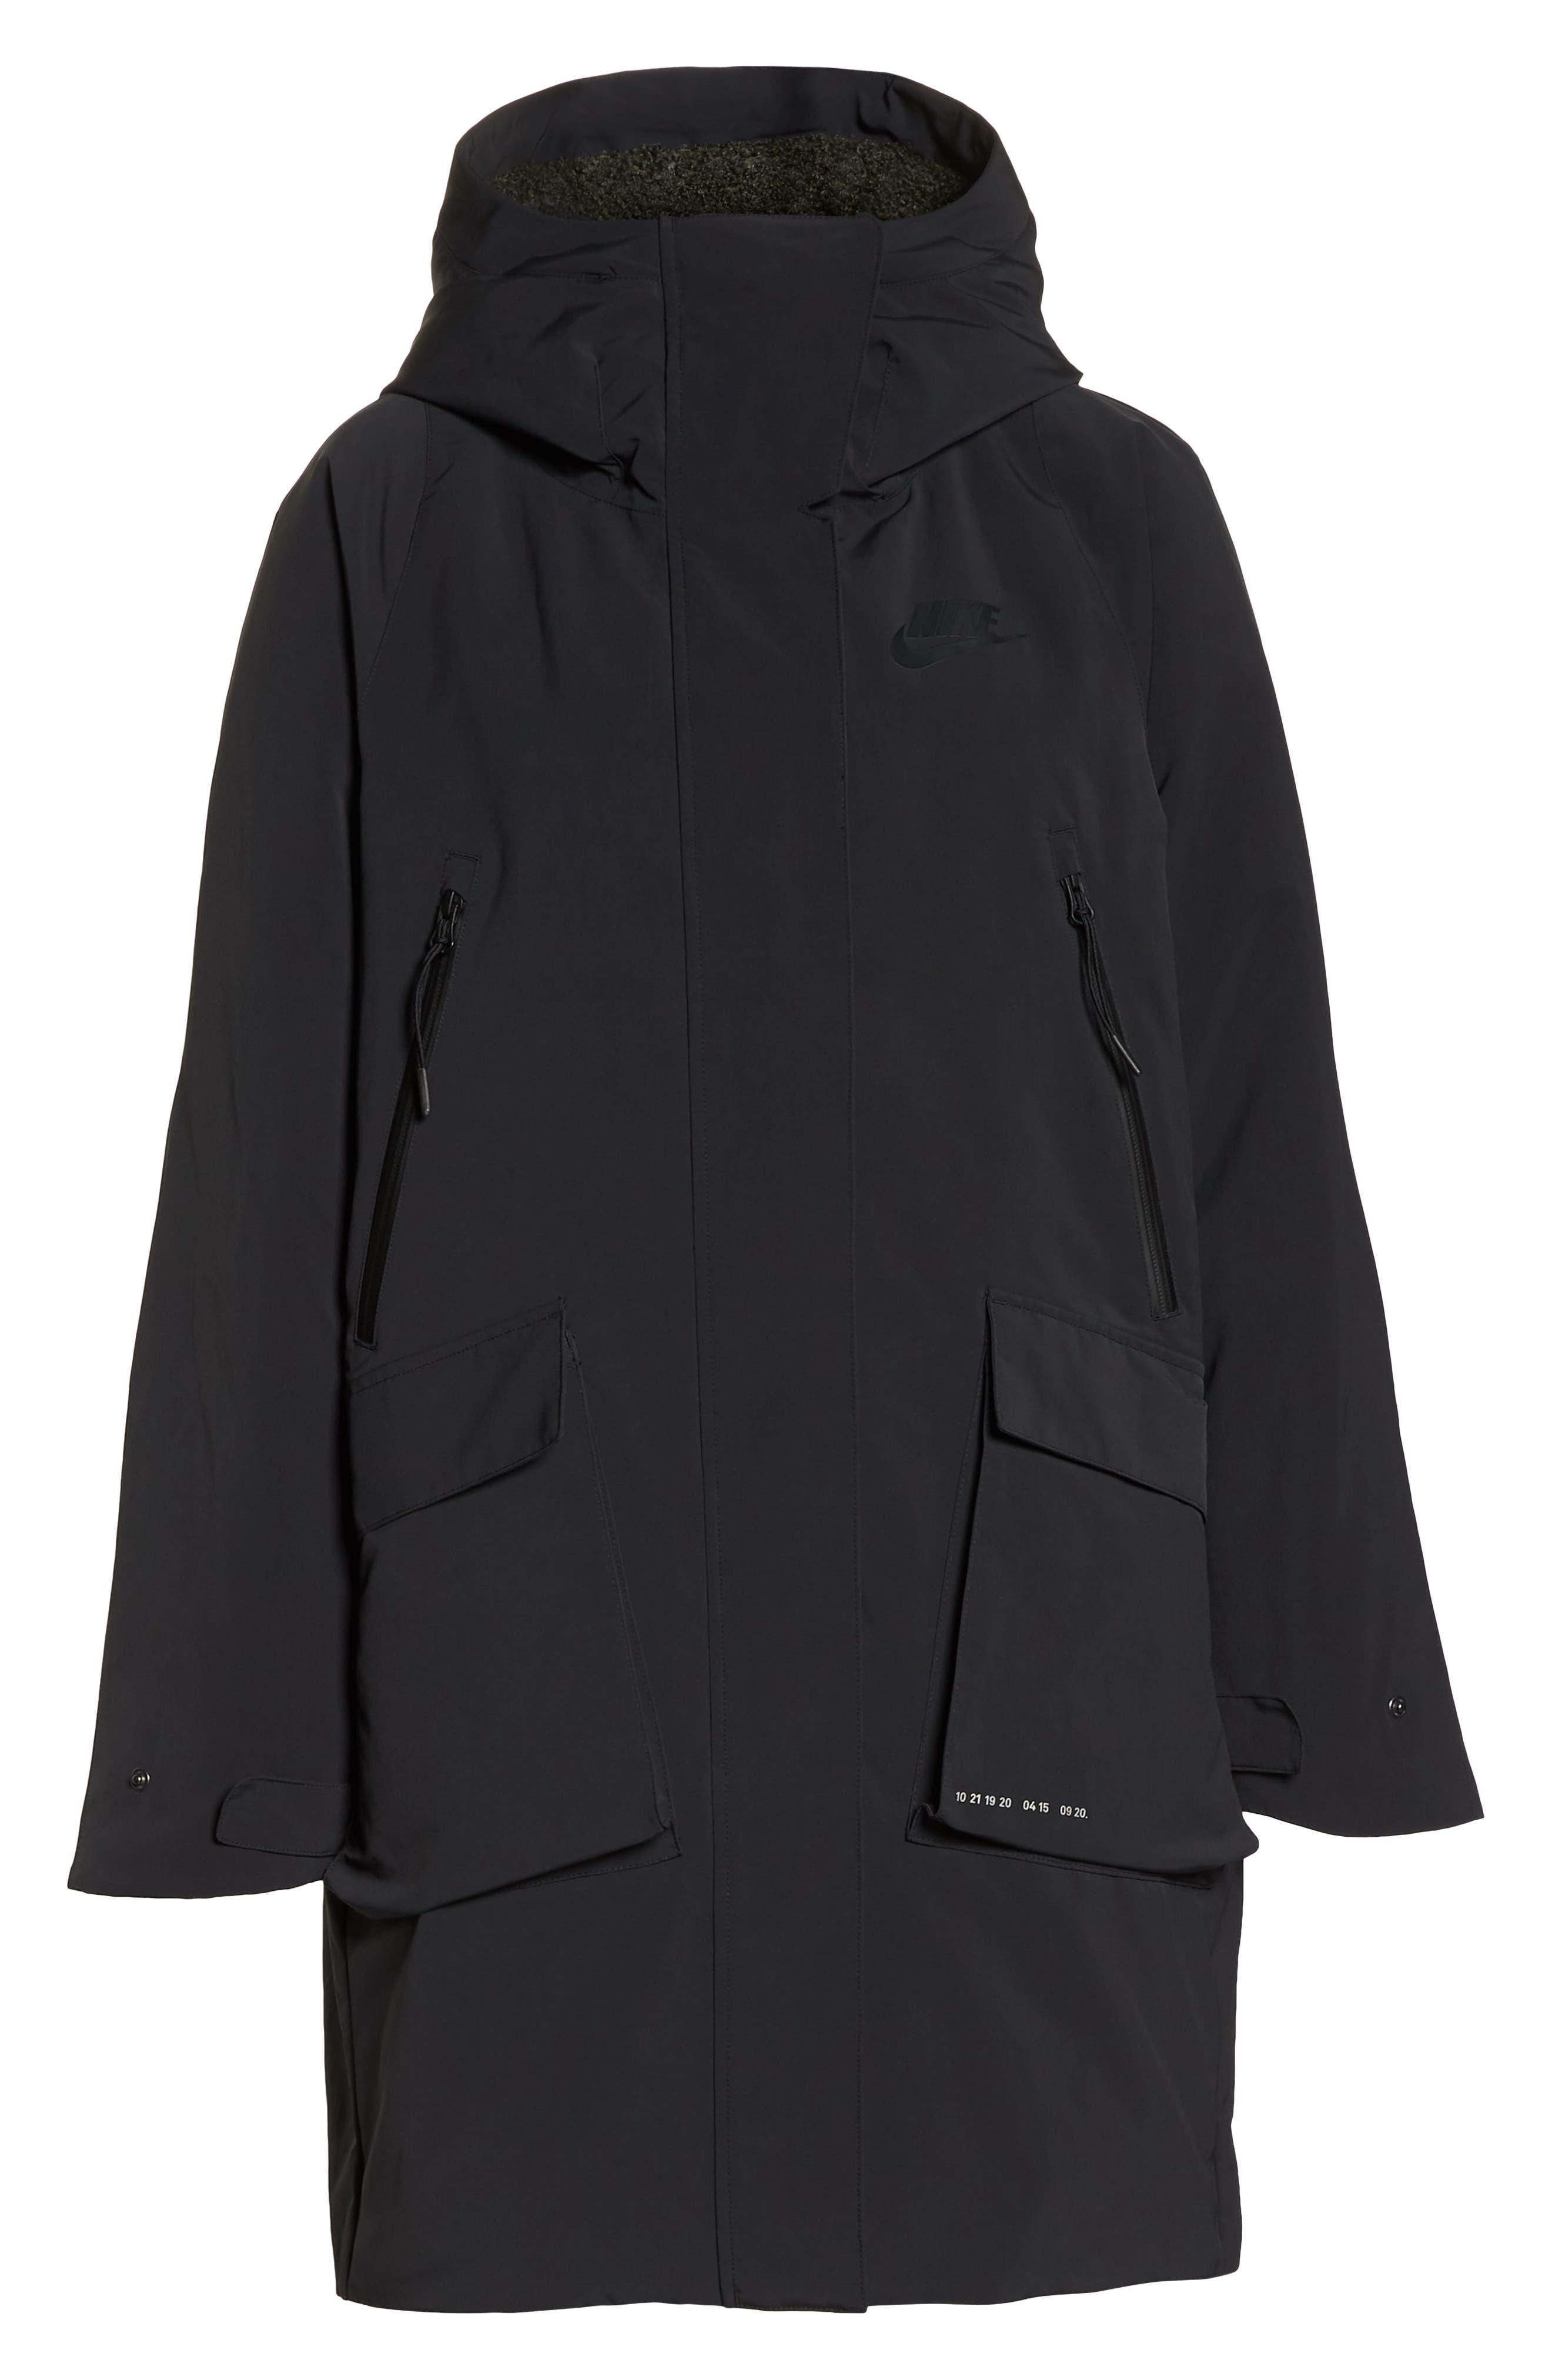 Sportswear Tech Pack Women's Down Fill Parka,                             Alternate thumbnail 6, color,                             BLACK/ NEWSPRINT/ BLACK